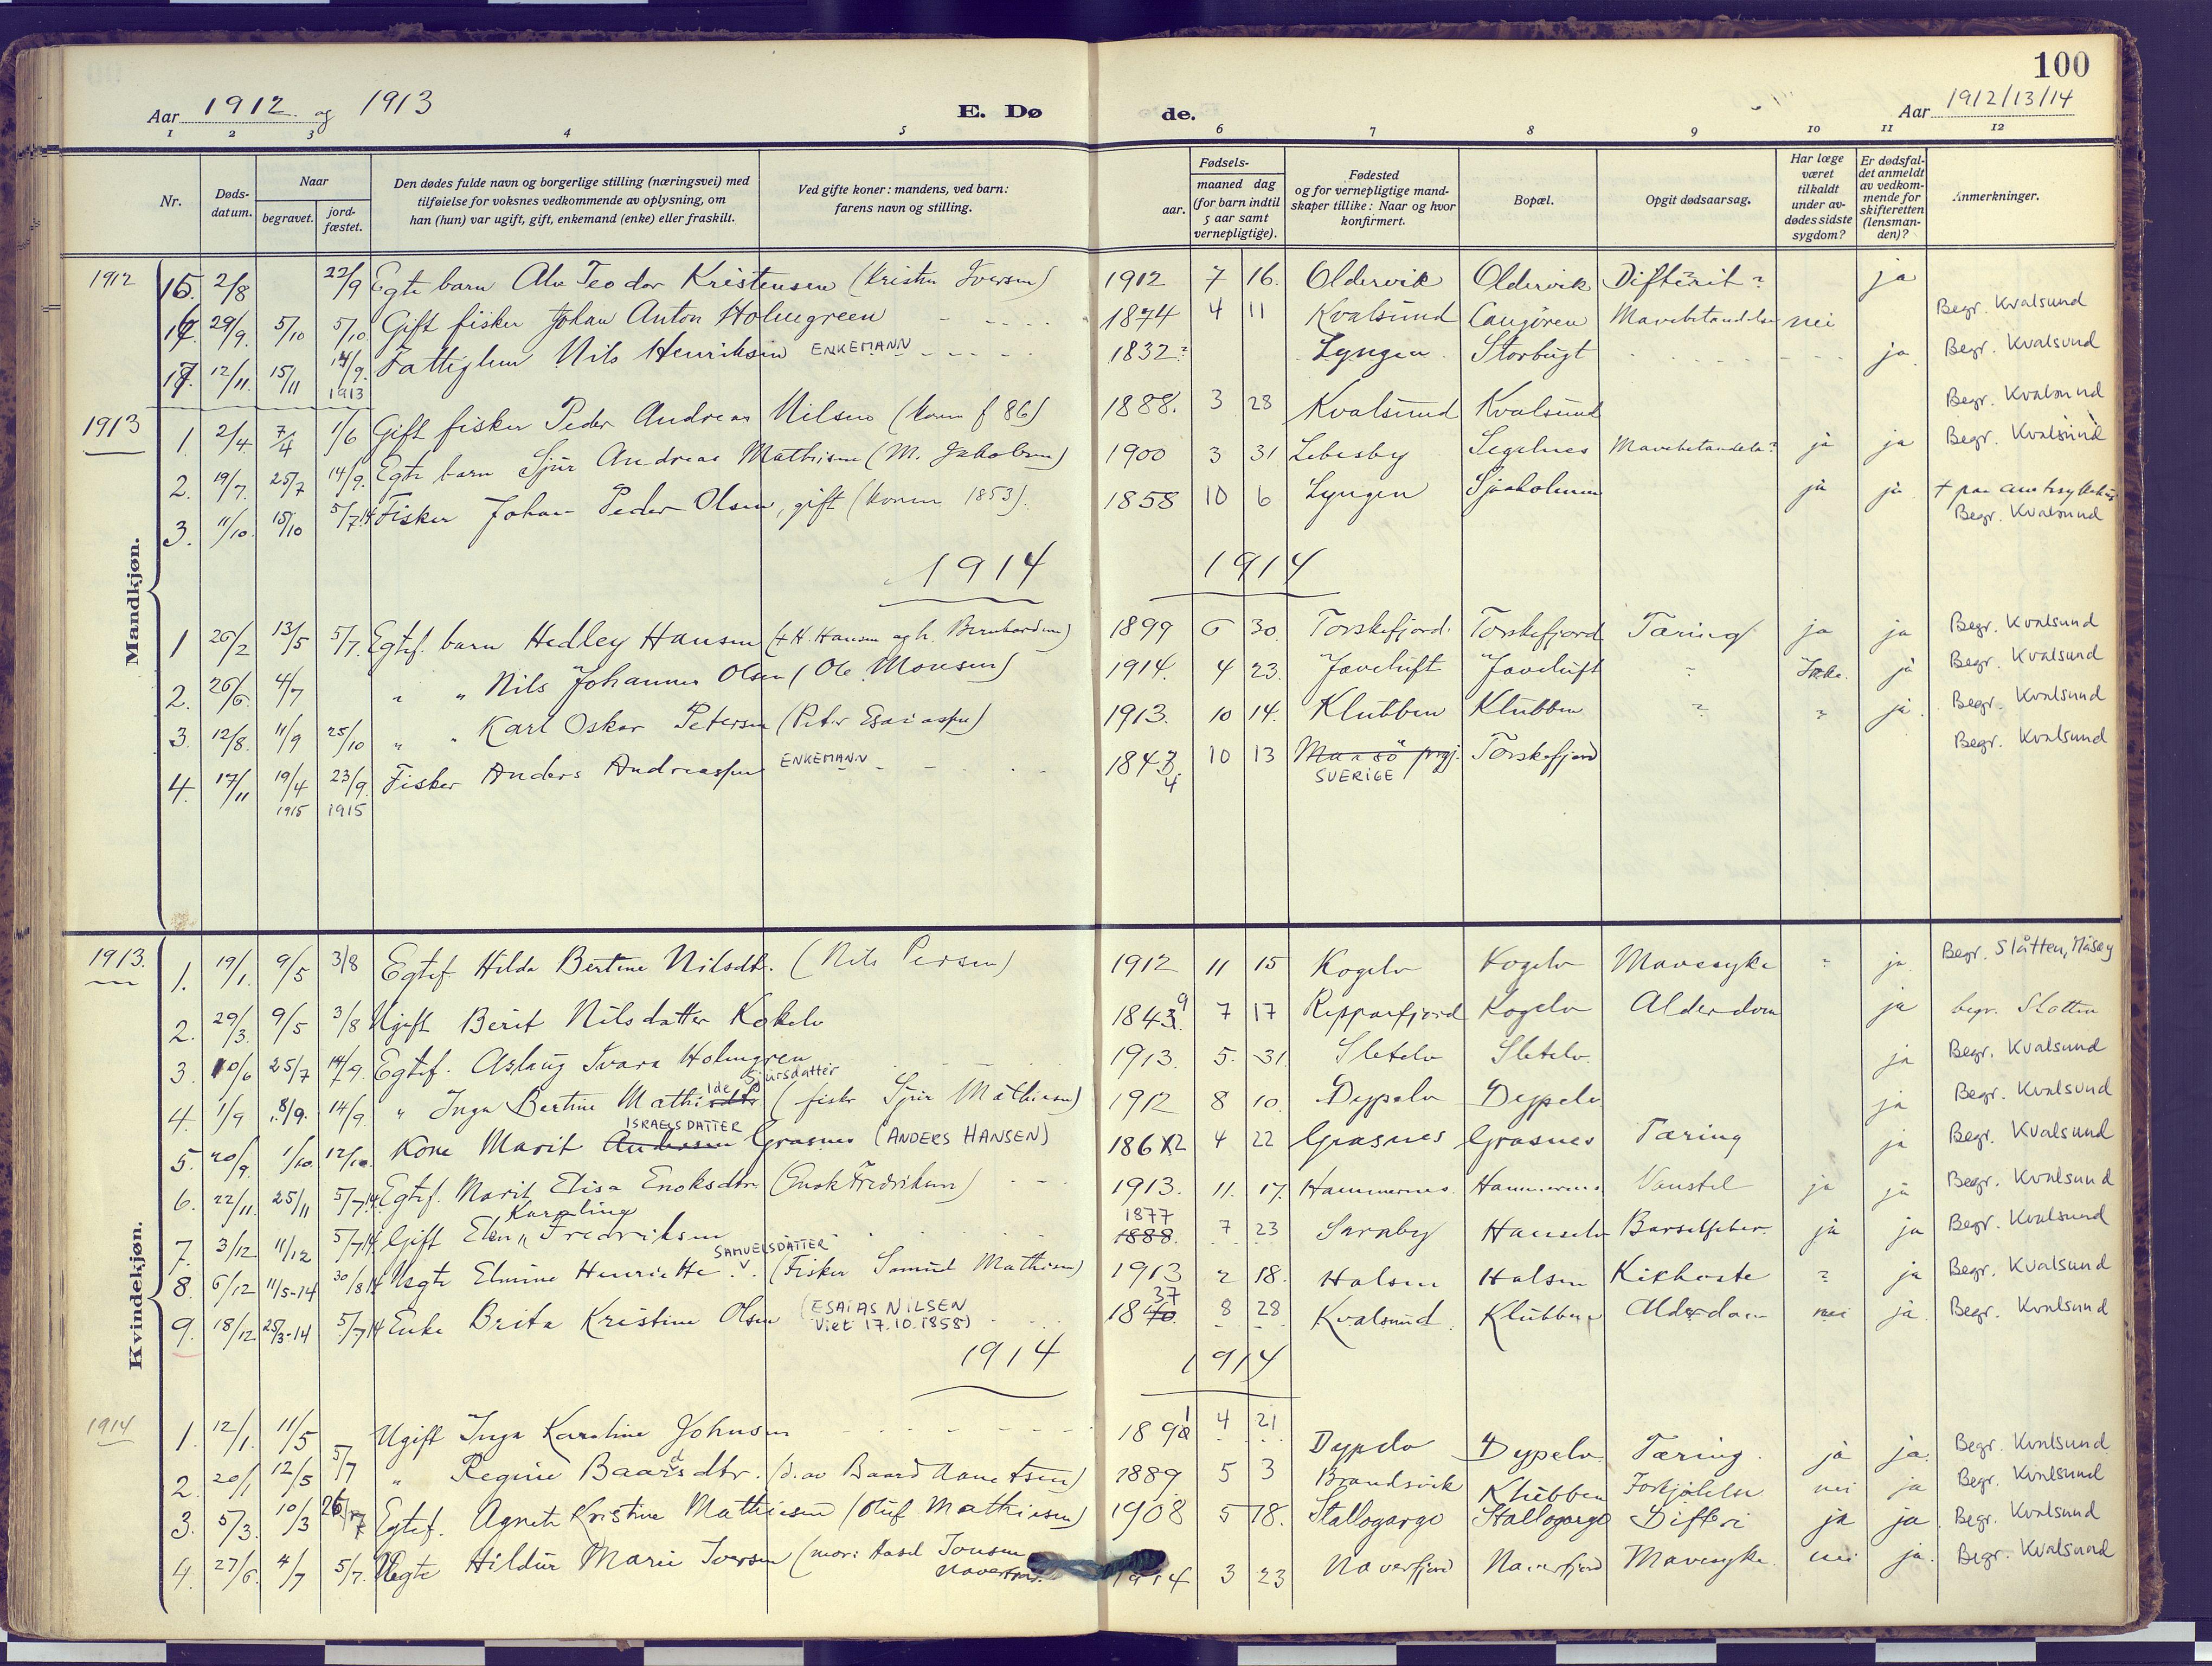 SATØ, Hammerfest sokneprestembete, Ministerialbok nr. 16, 1908-1923, s. 100